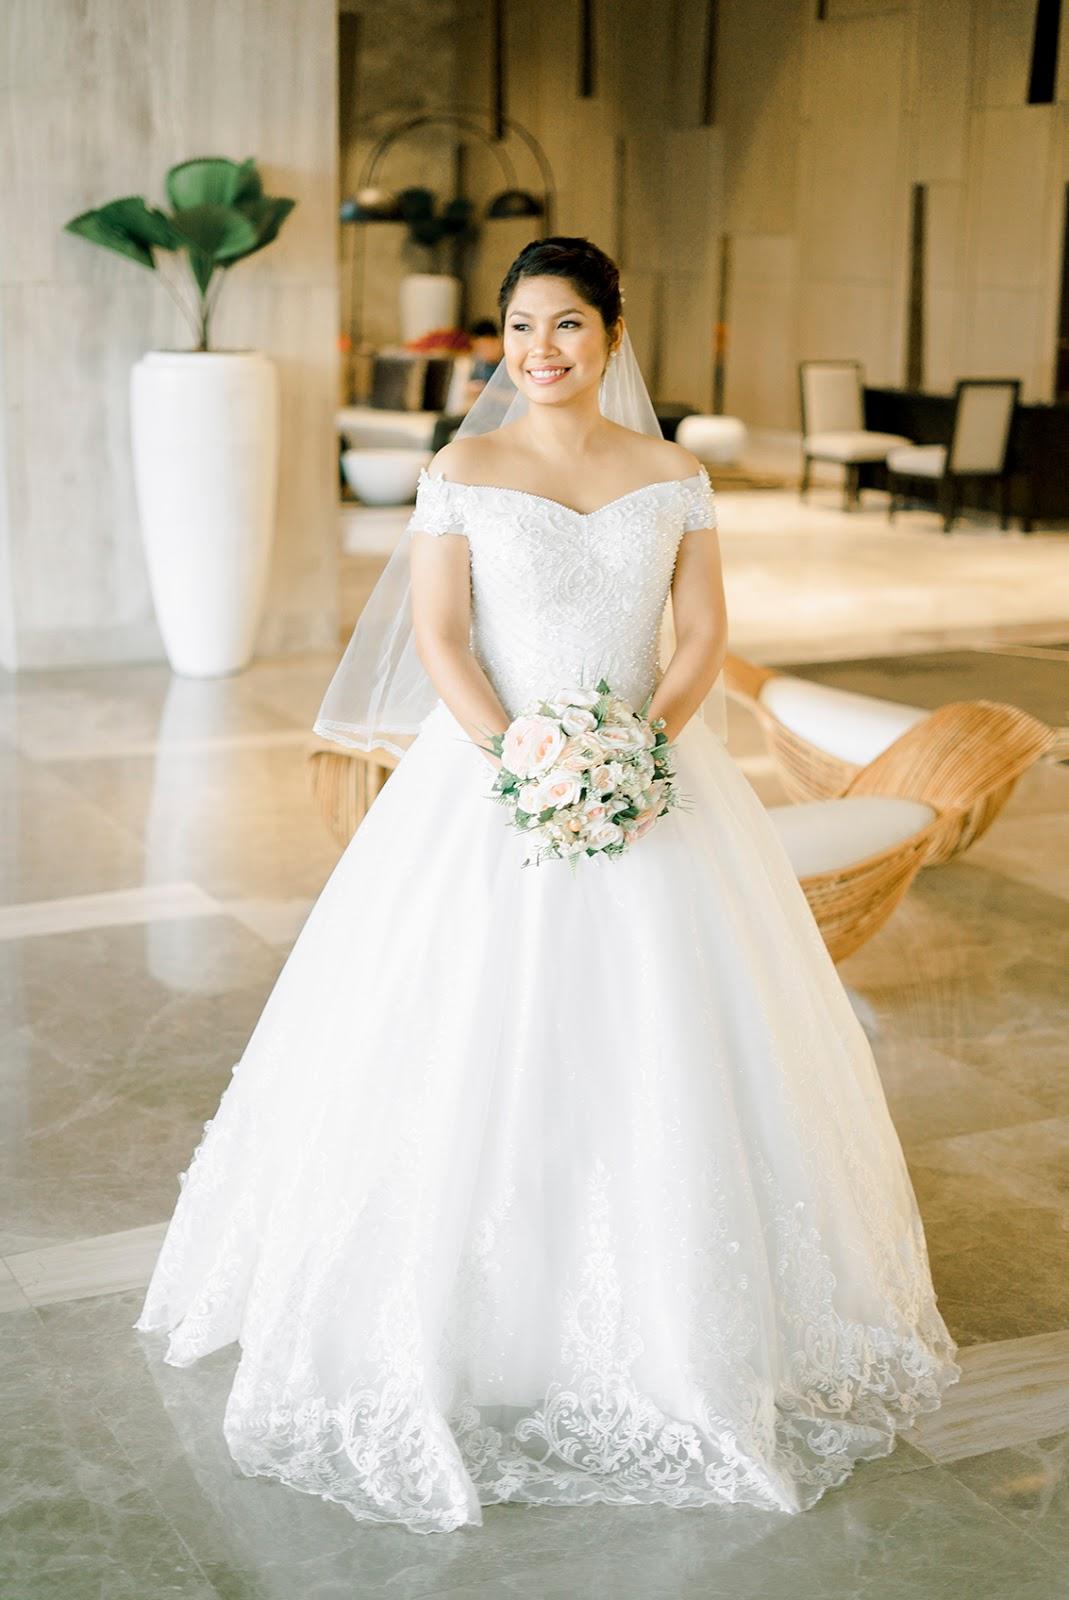 Wedding Gowns Prices Philippines Pemerintah Kota Ambon